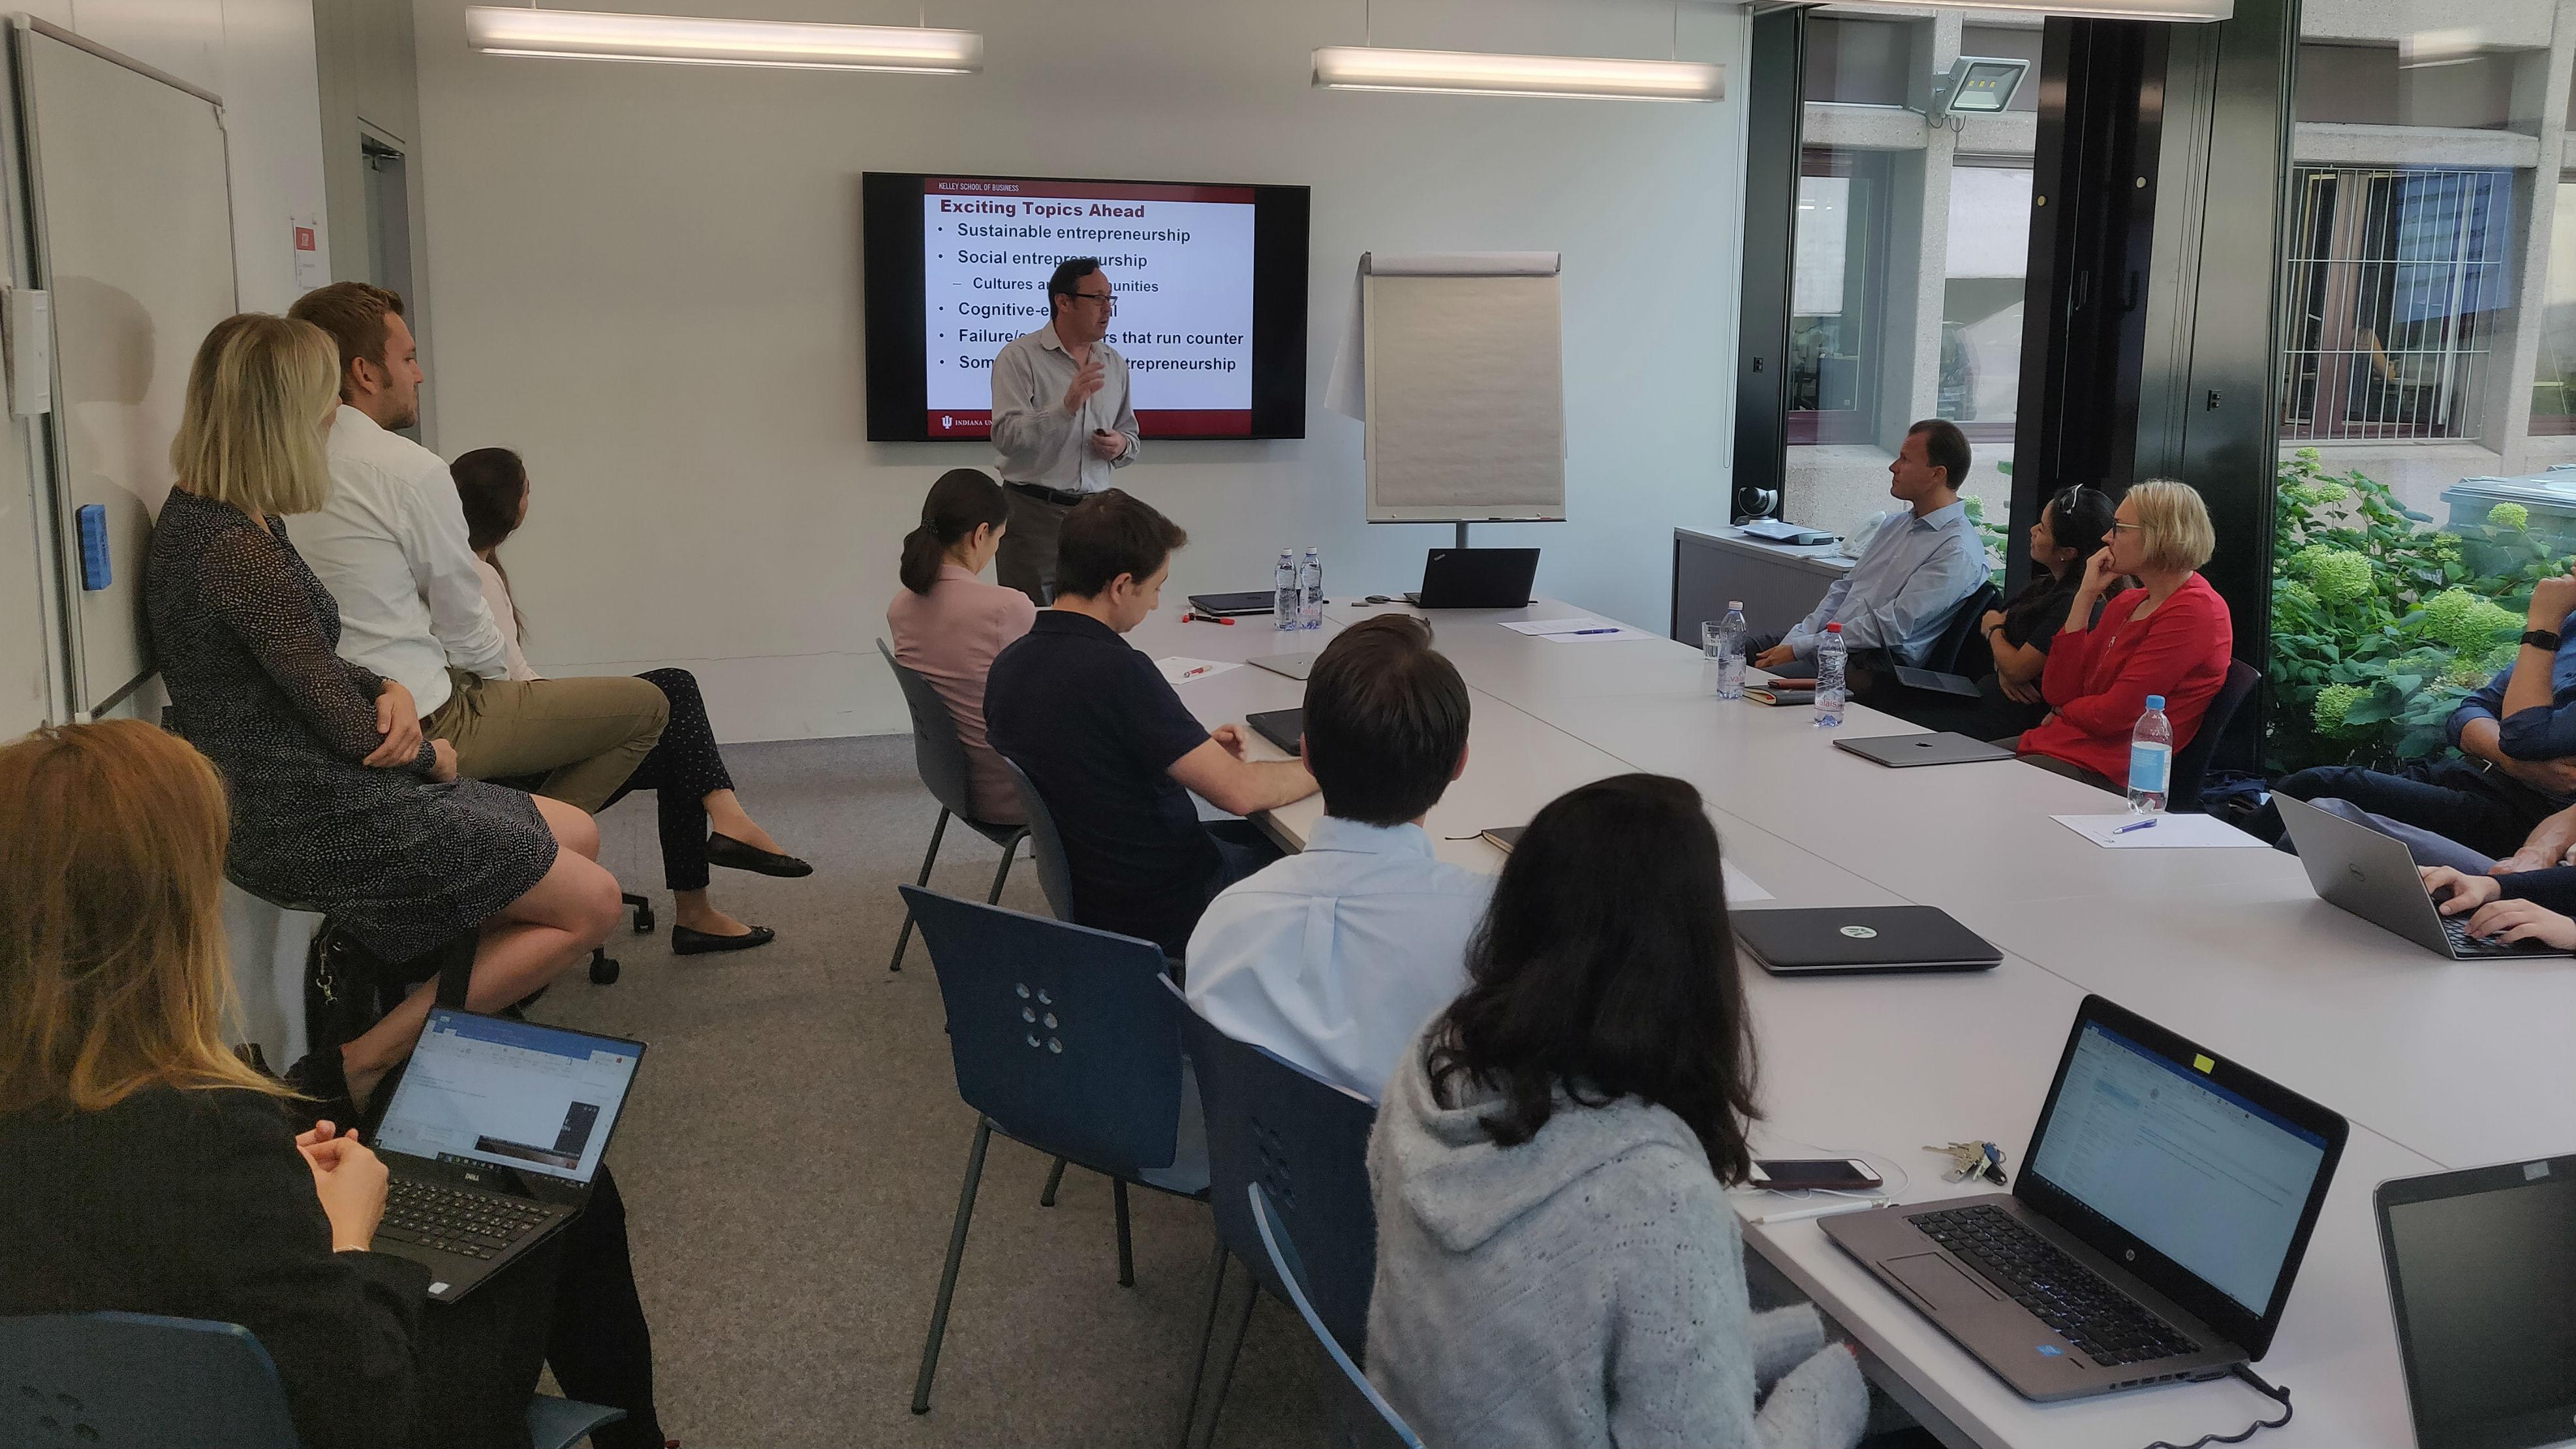 Research Seminar with Dean Shepherd